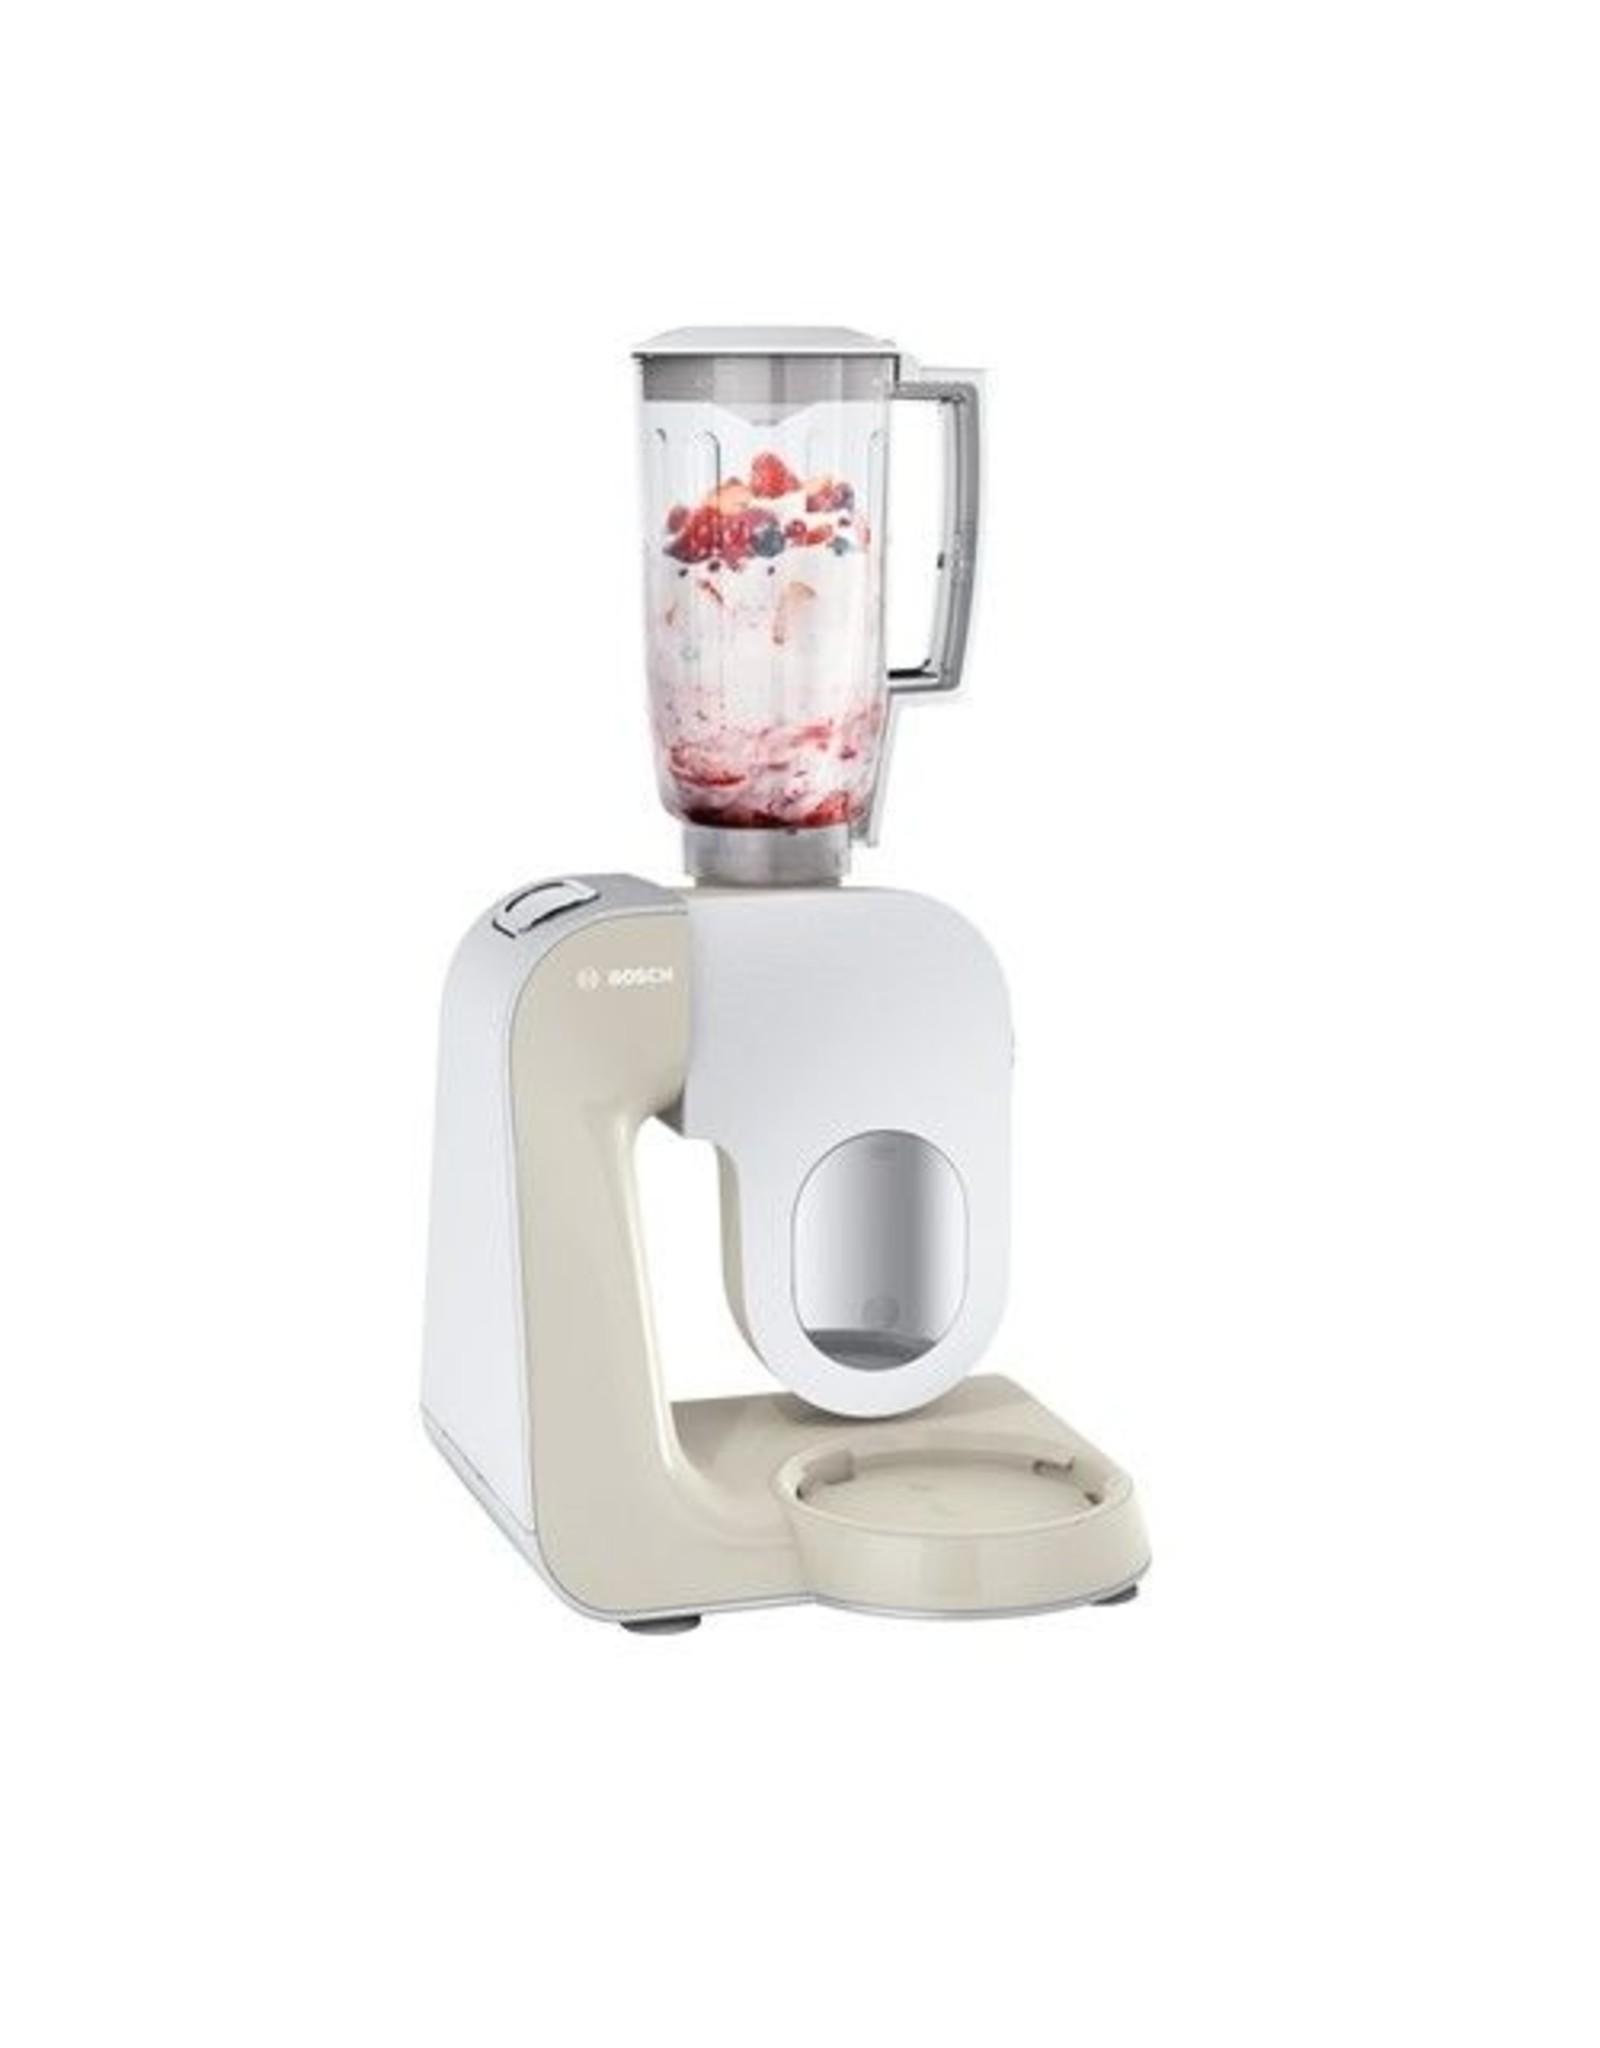 Bosch Bosch MUM58L20 1000W 3.9l Grijs, Roestvrijstaal, Wit keukenmachine